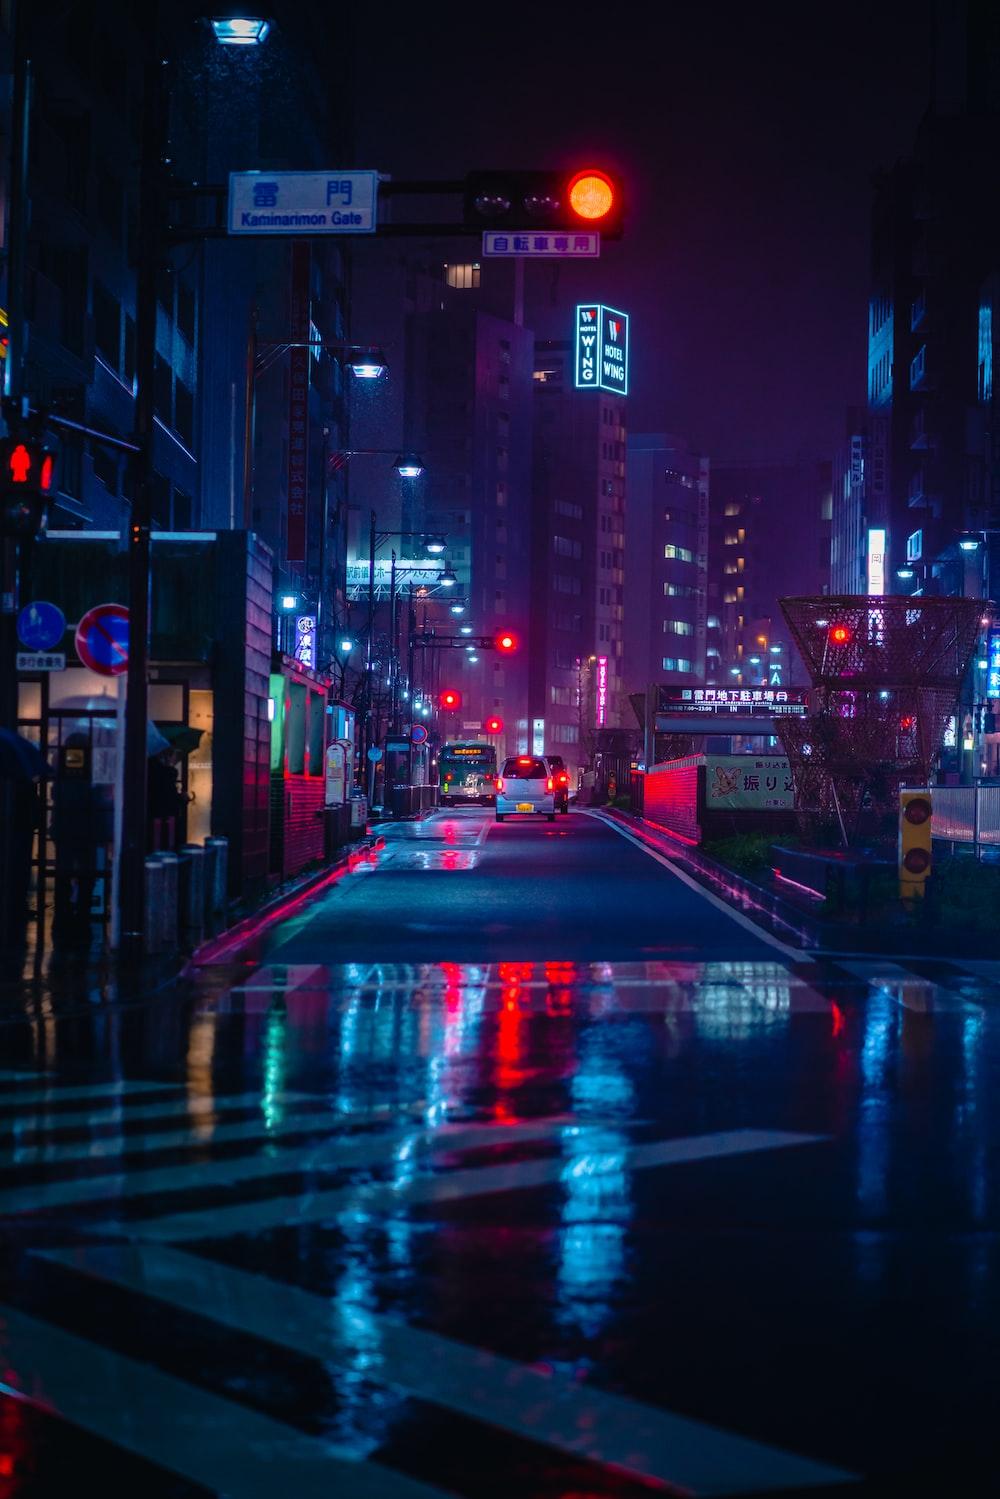 Tokyo Neon Pictures Download Free Images On Unsplash Cat in tokyo 5k, hd artist, 4k wallpapers. tokyo neon pictures download free